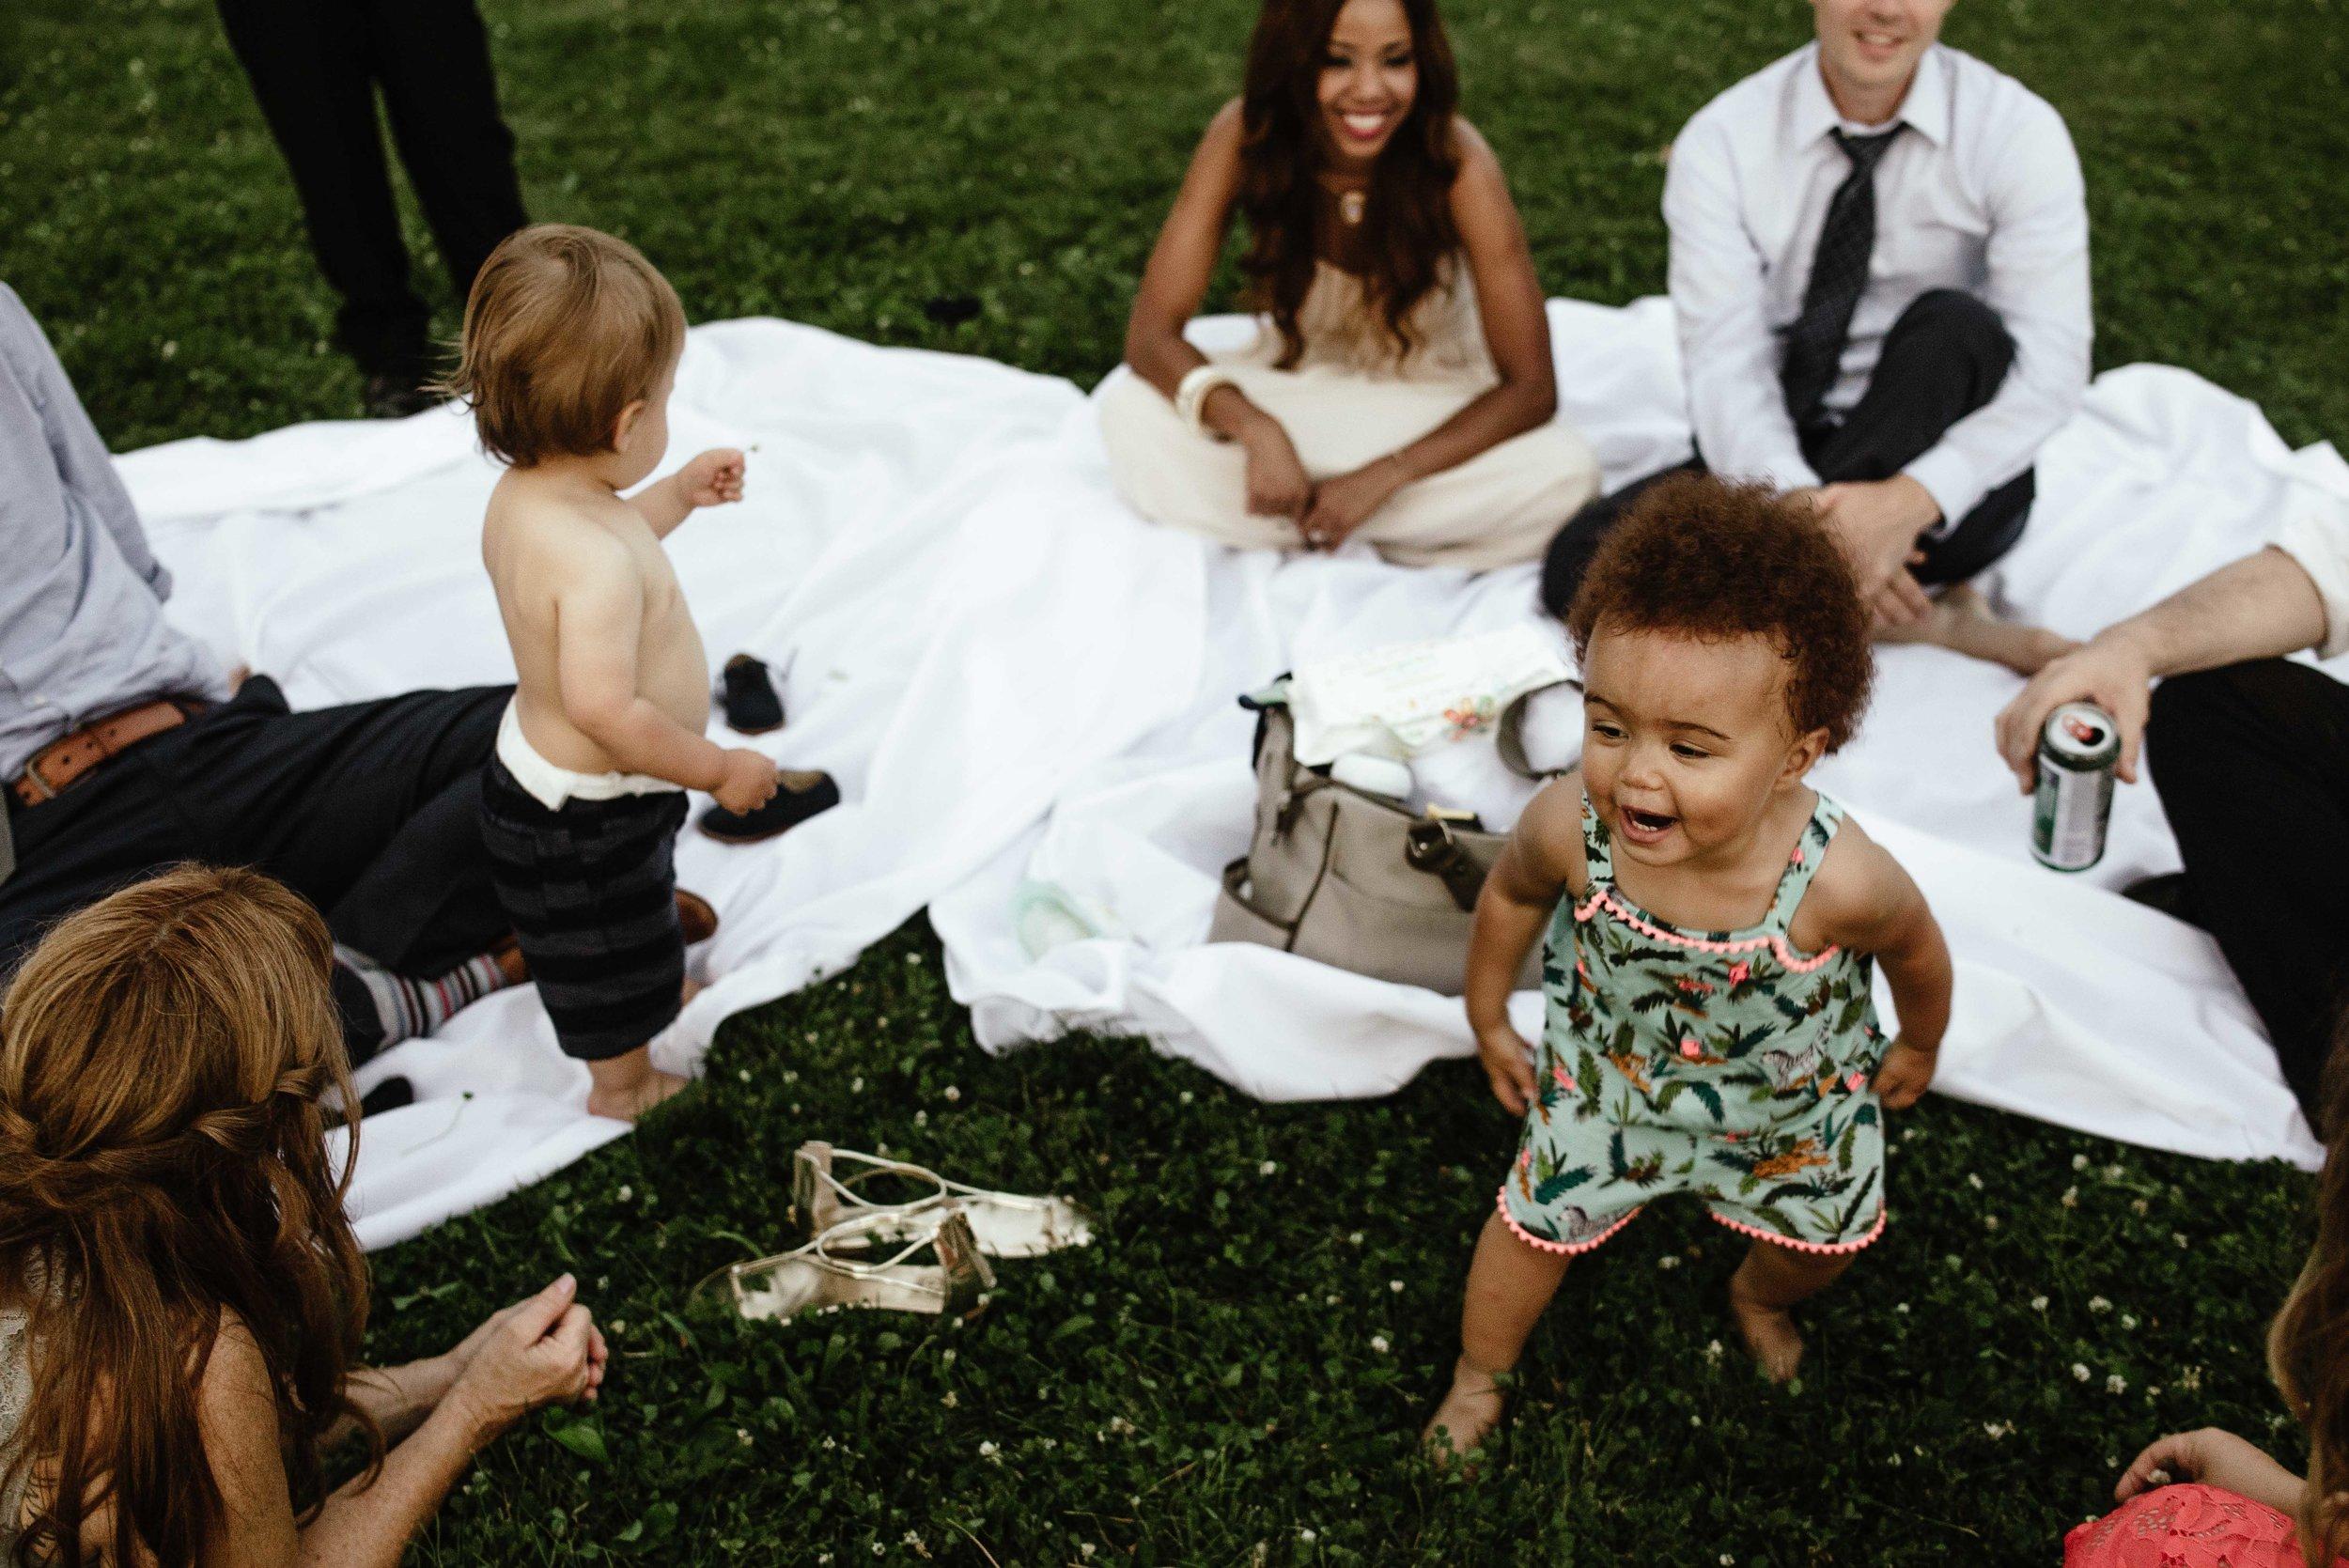 Mina-Steve-Blog-Indianapolis-Wedding-178.jpg